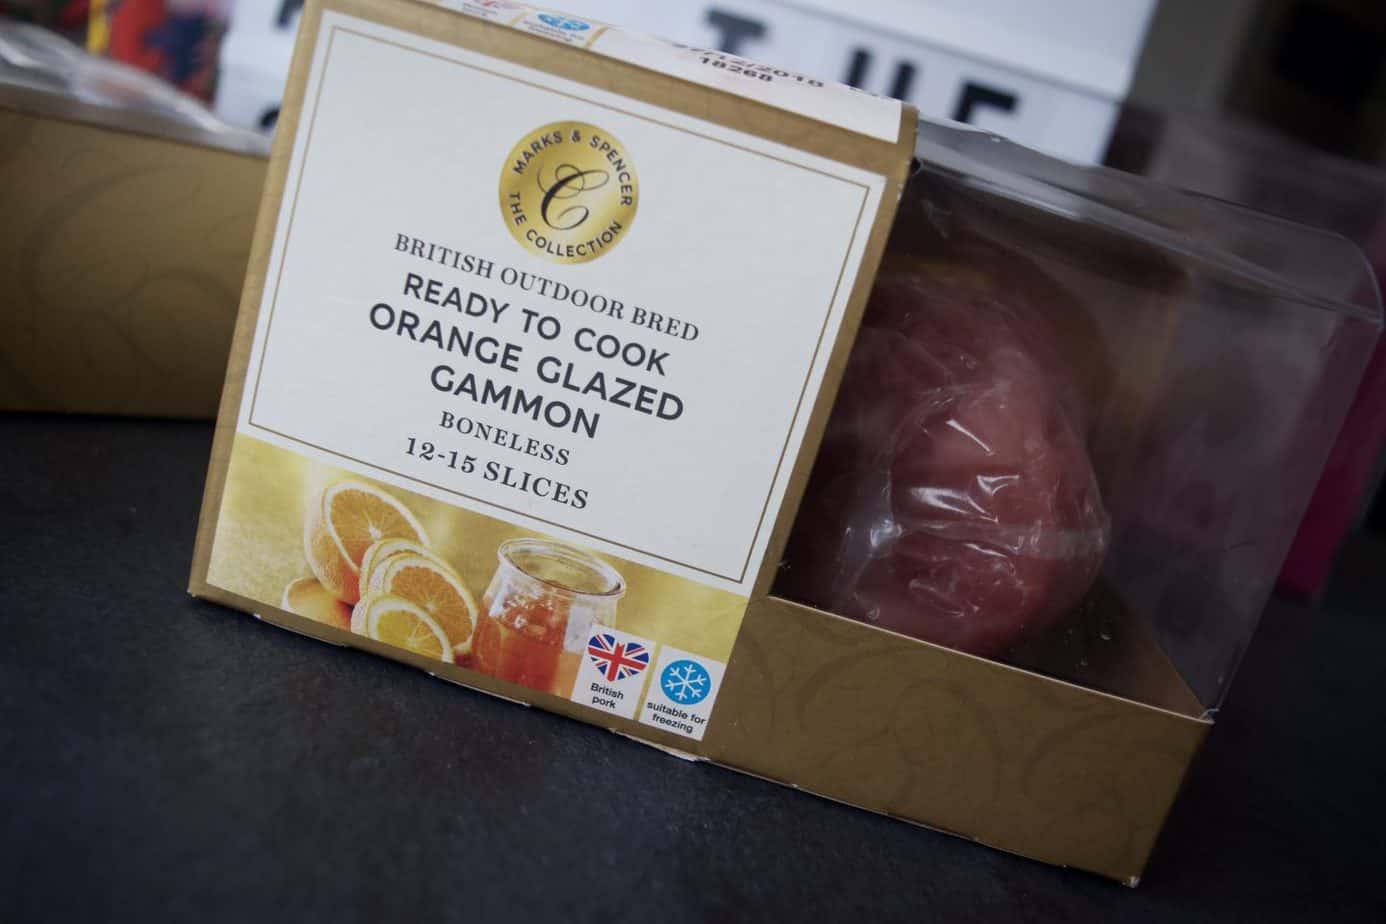 Festive Marks and Spencer treats including orange glazed gammon